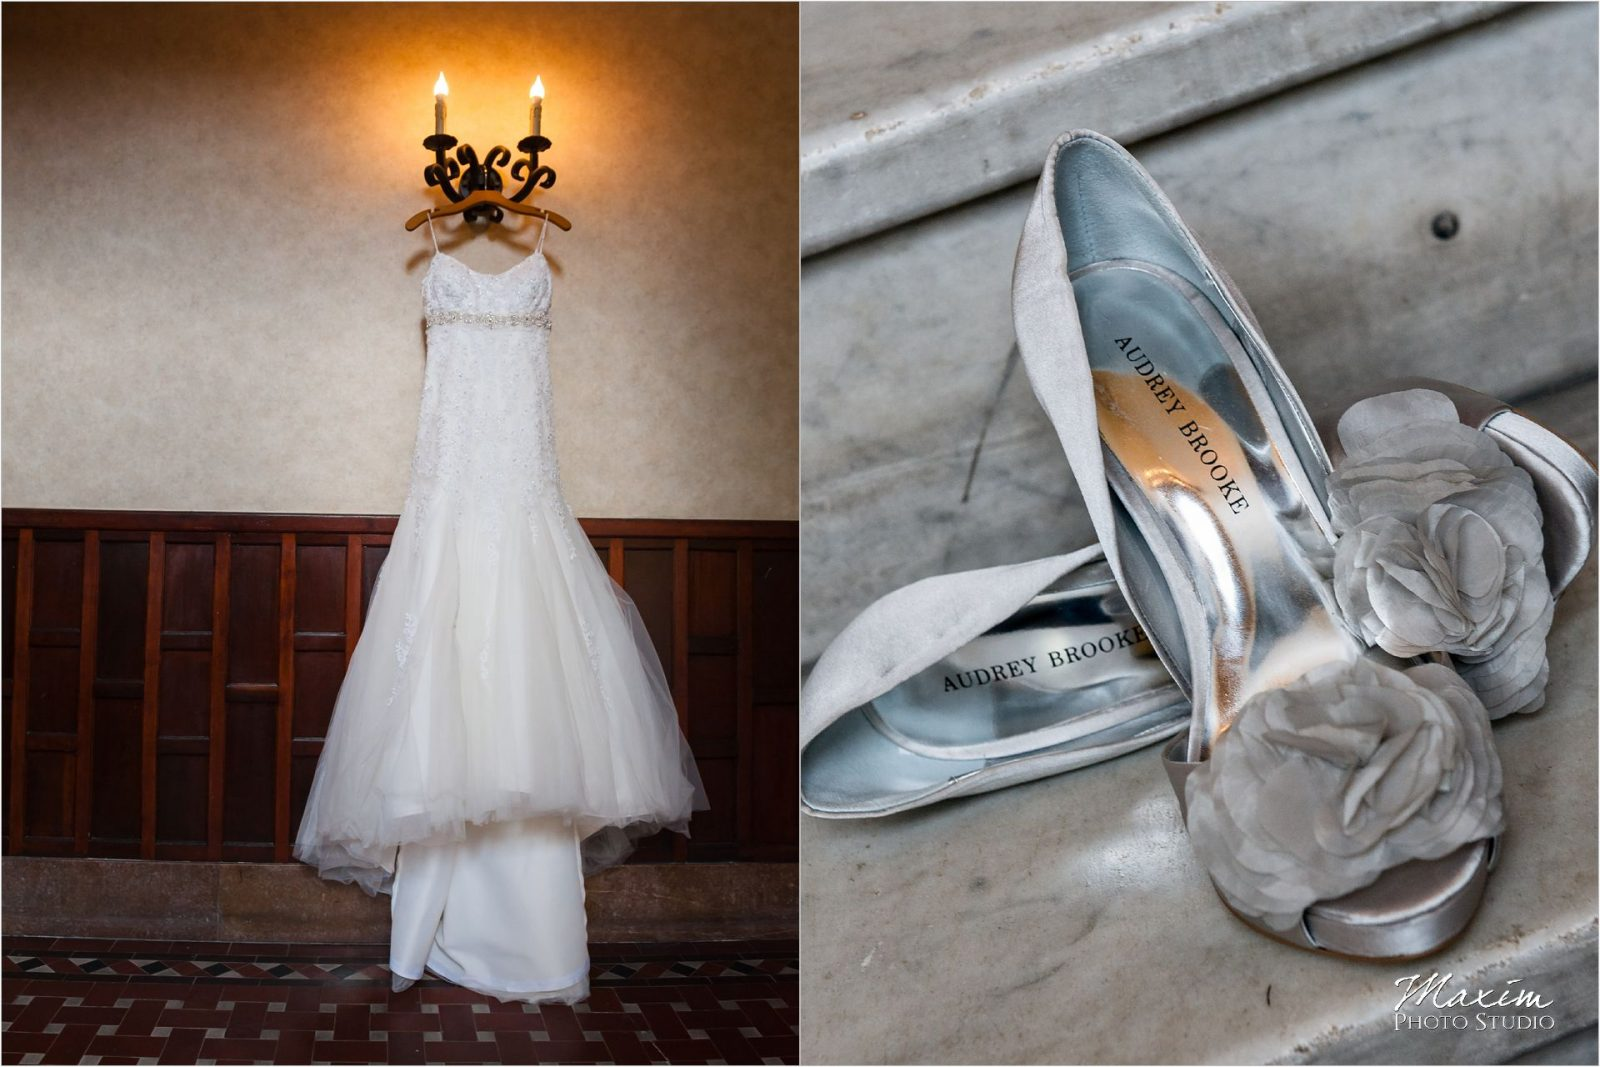 Cincinnati Bell Event Centre Wedding Bride Preparations